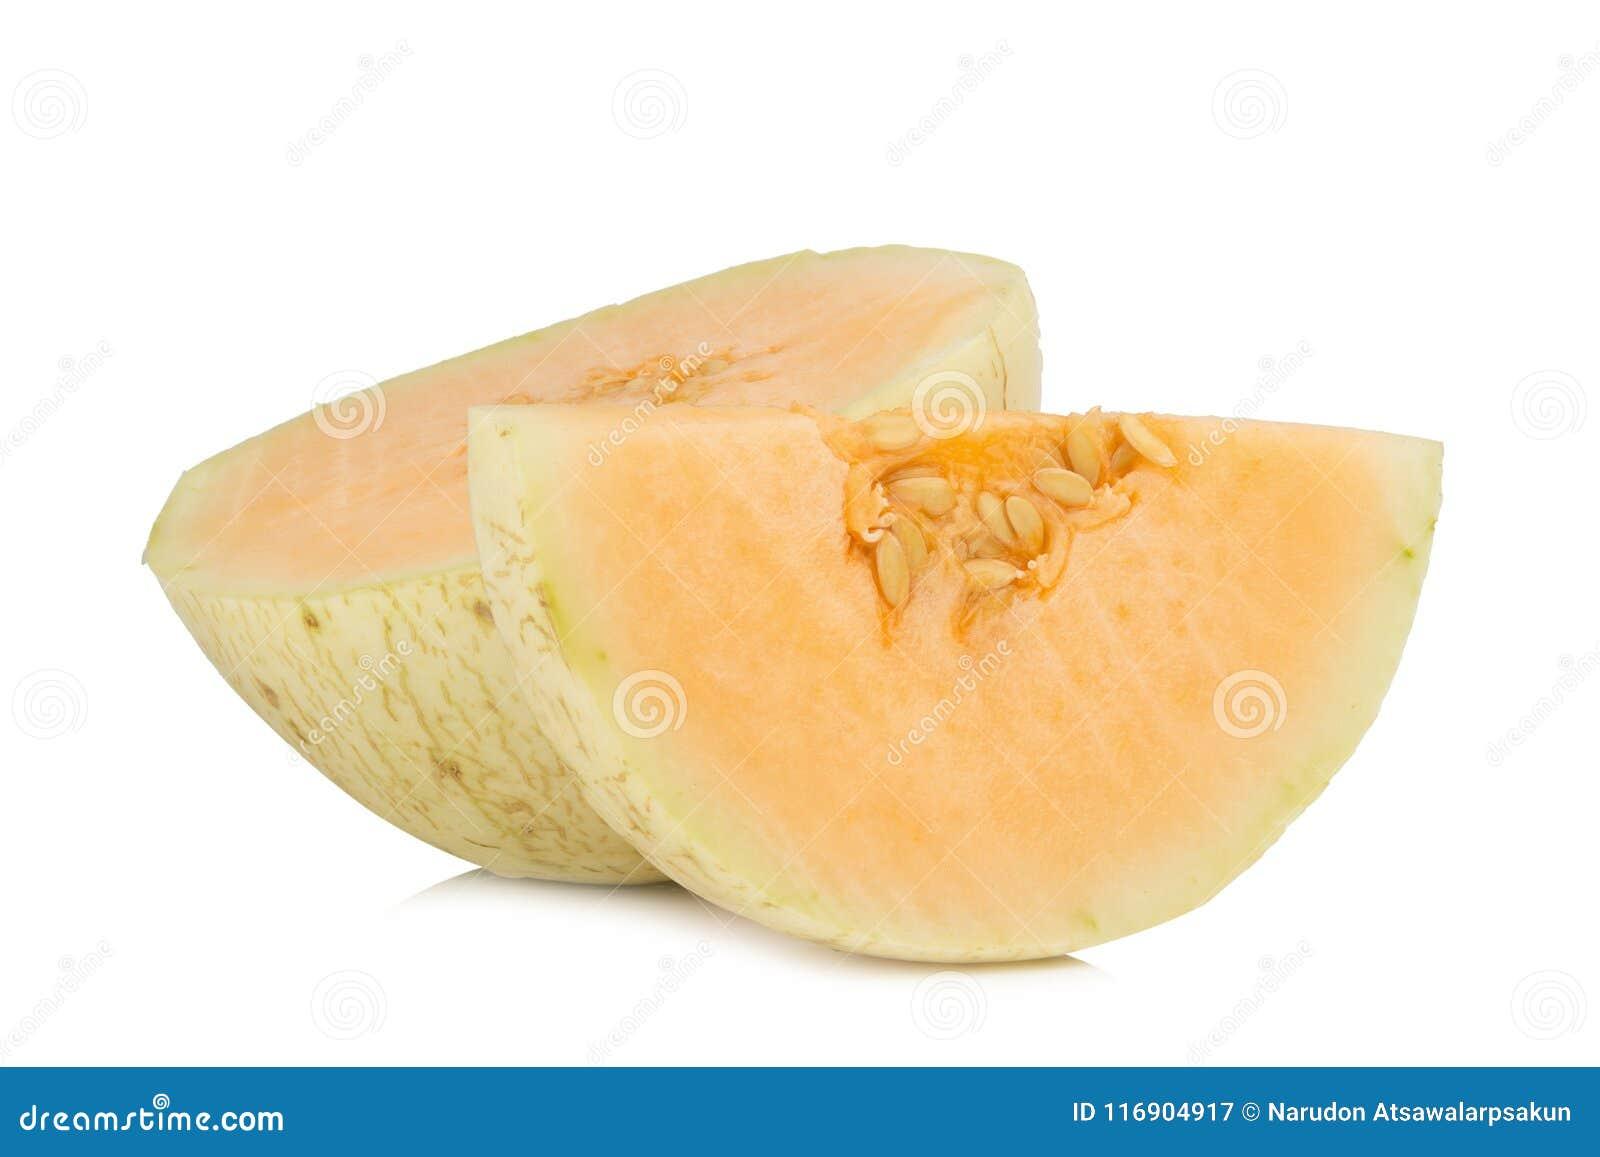 melon& x28;sunlady& x29; slice. half. isolated on white background